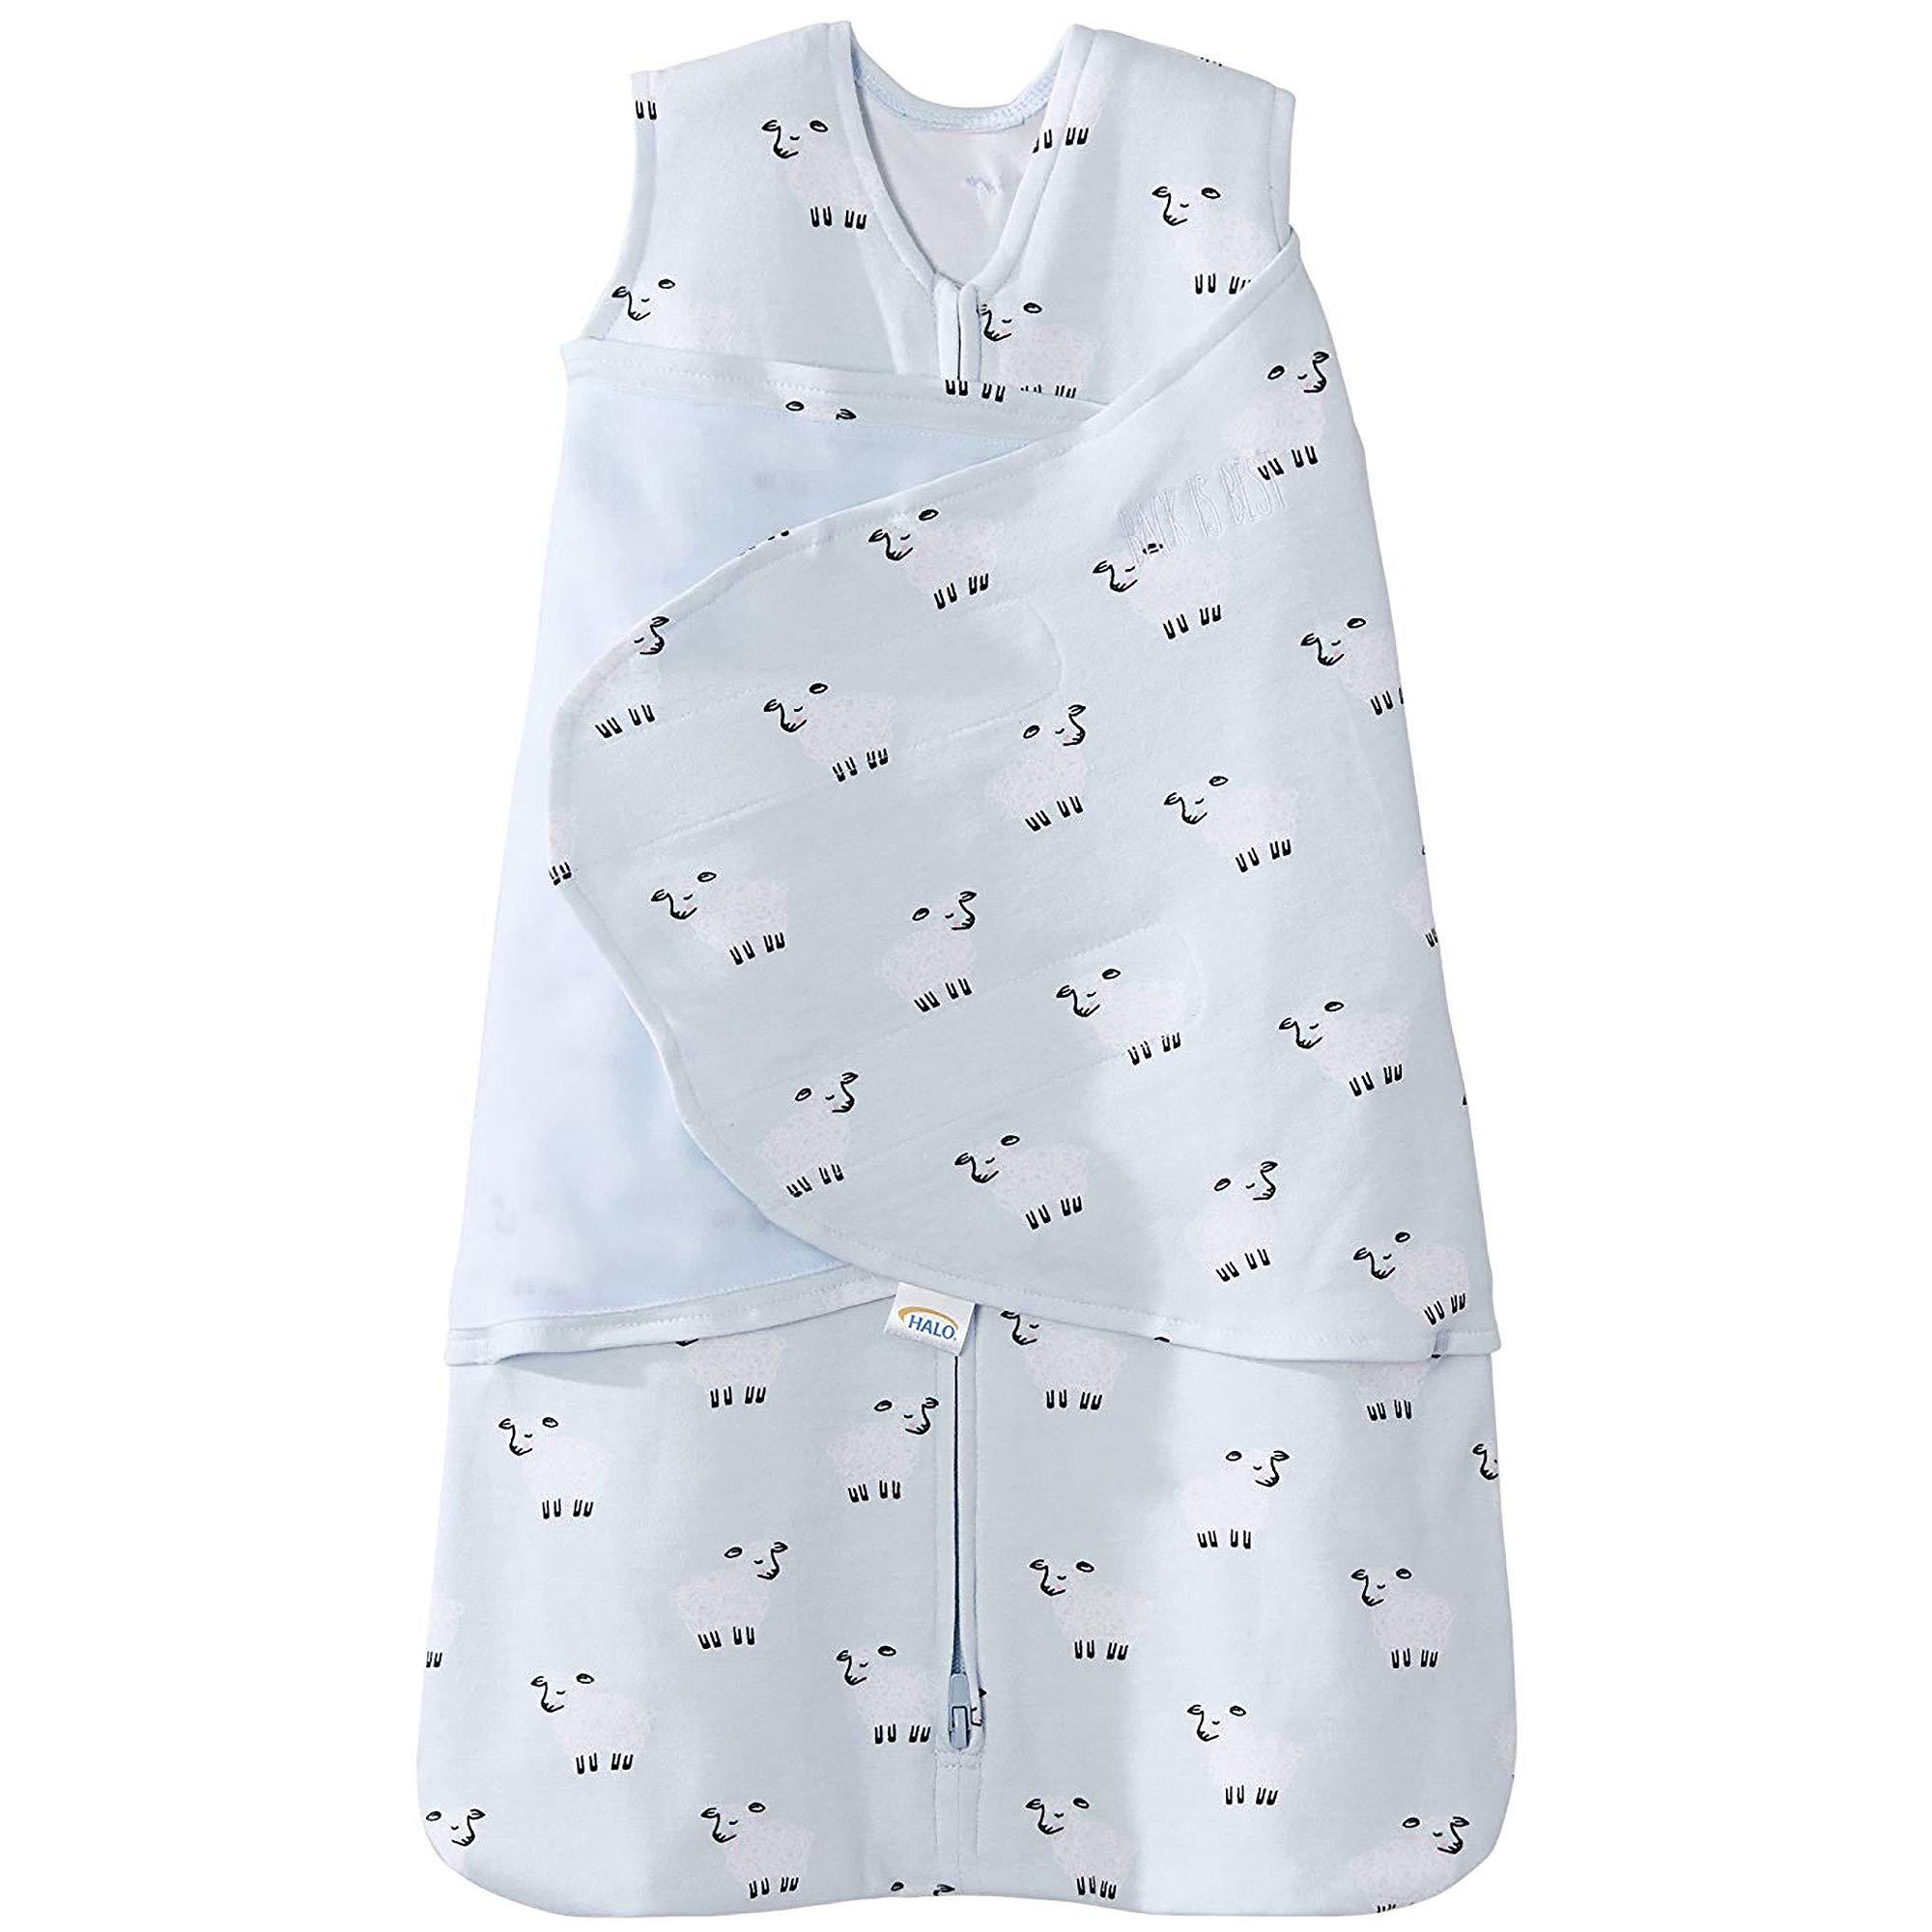 Halo 100% Cotton Sleepsack Swaddle Wearable Blanket, Aqua Sheep, Newborn by Halo